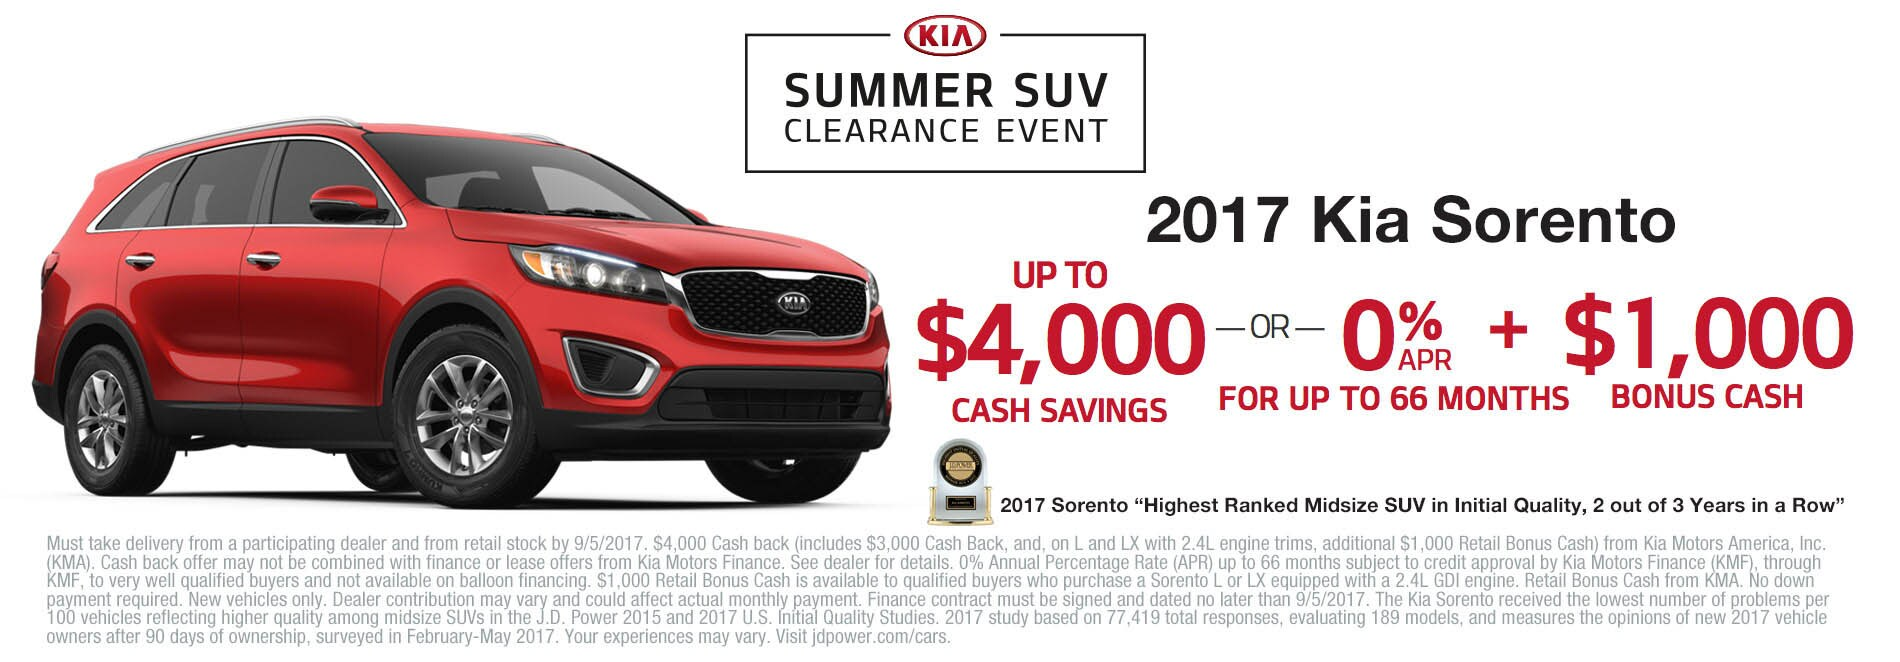 Get $4,000 cash savings or 0% APR financing plus $1,000 cash savings when you purchase a 2017 Kia Sorento.